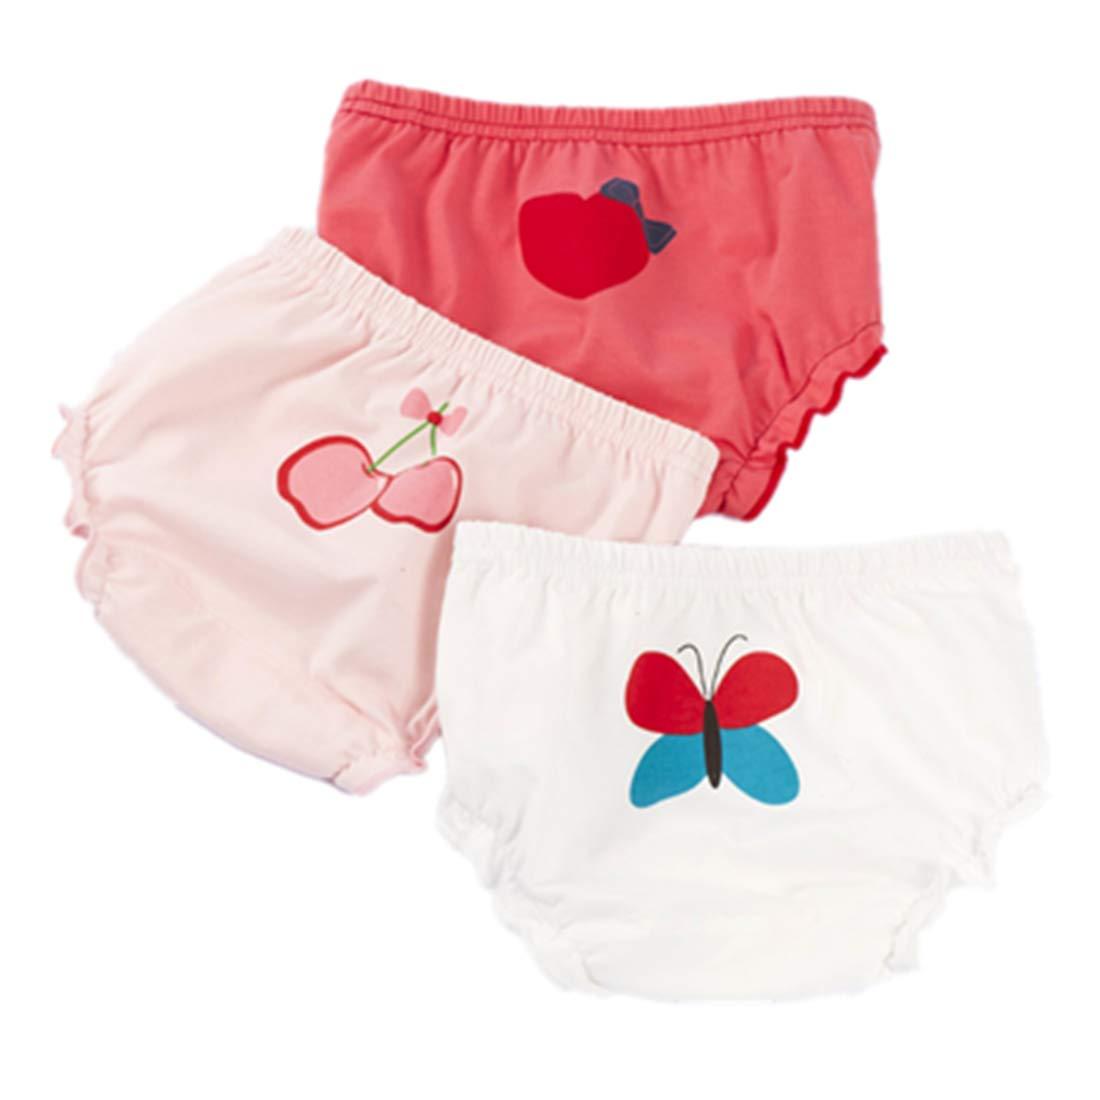 AYIYO Baby Girls Boys Owl Printed Underwear Cotton Training Shorts Bloomers Pack of 3